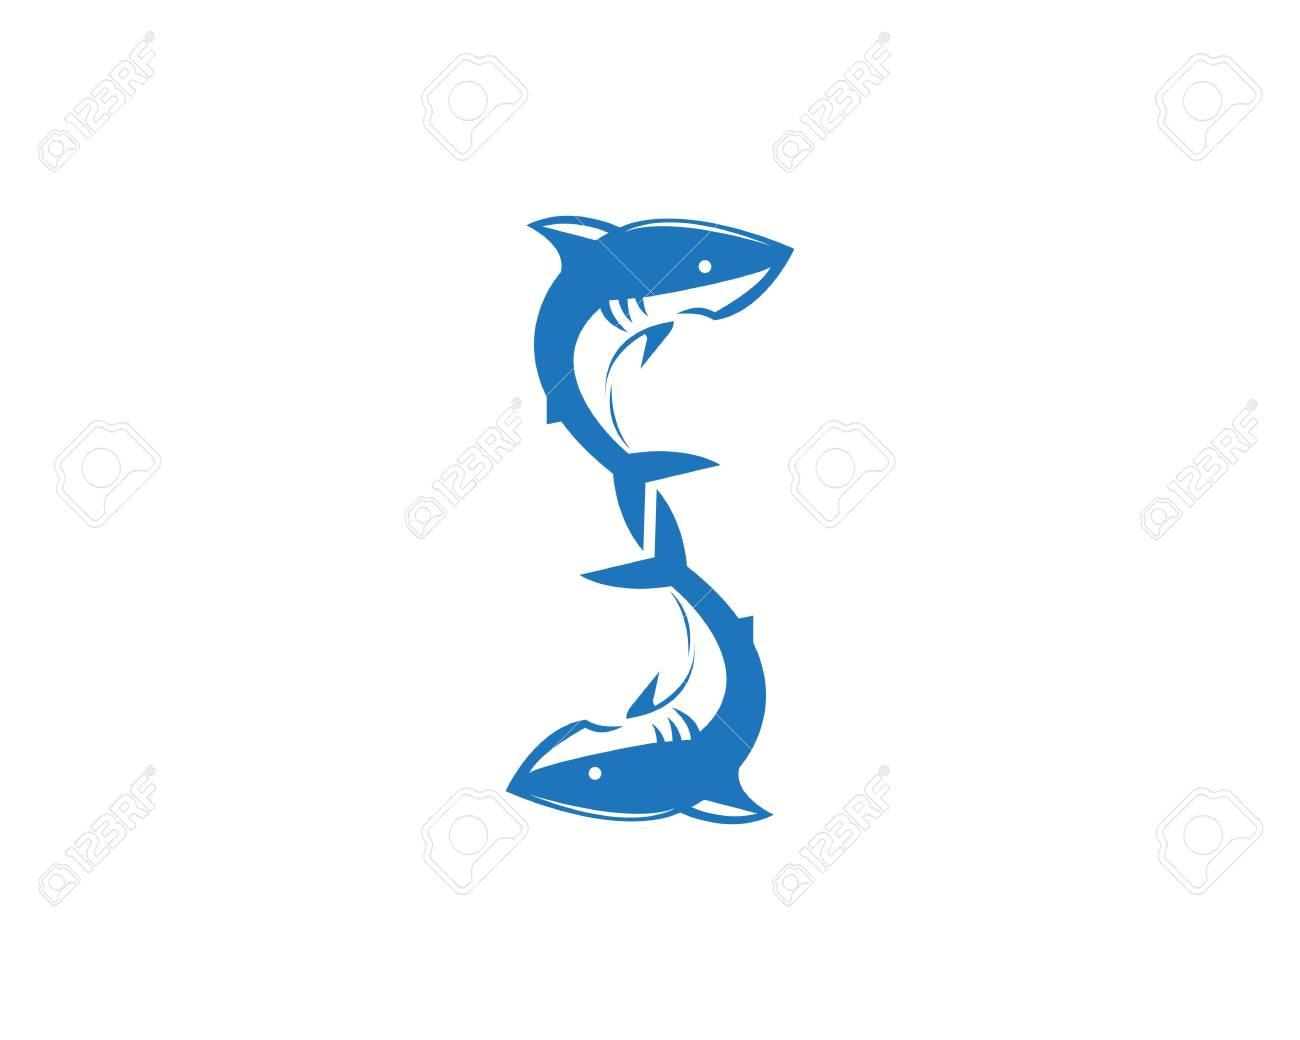 Shark Template | Shark Logo Template Royalty Free Cliparts Vectors And Stock